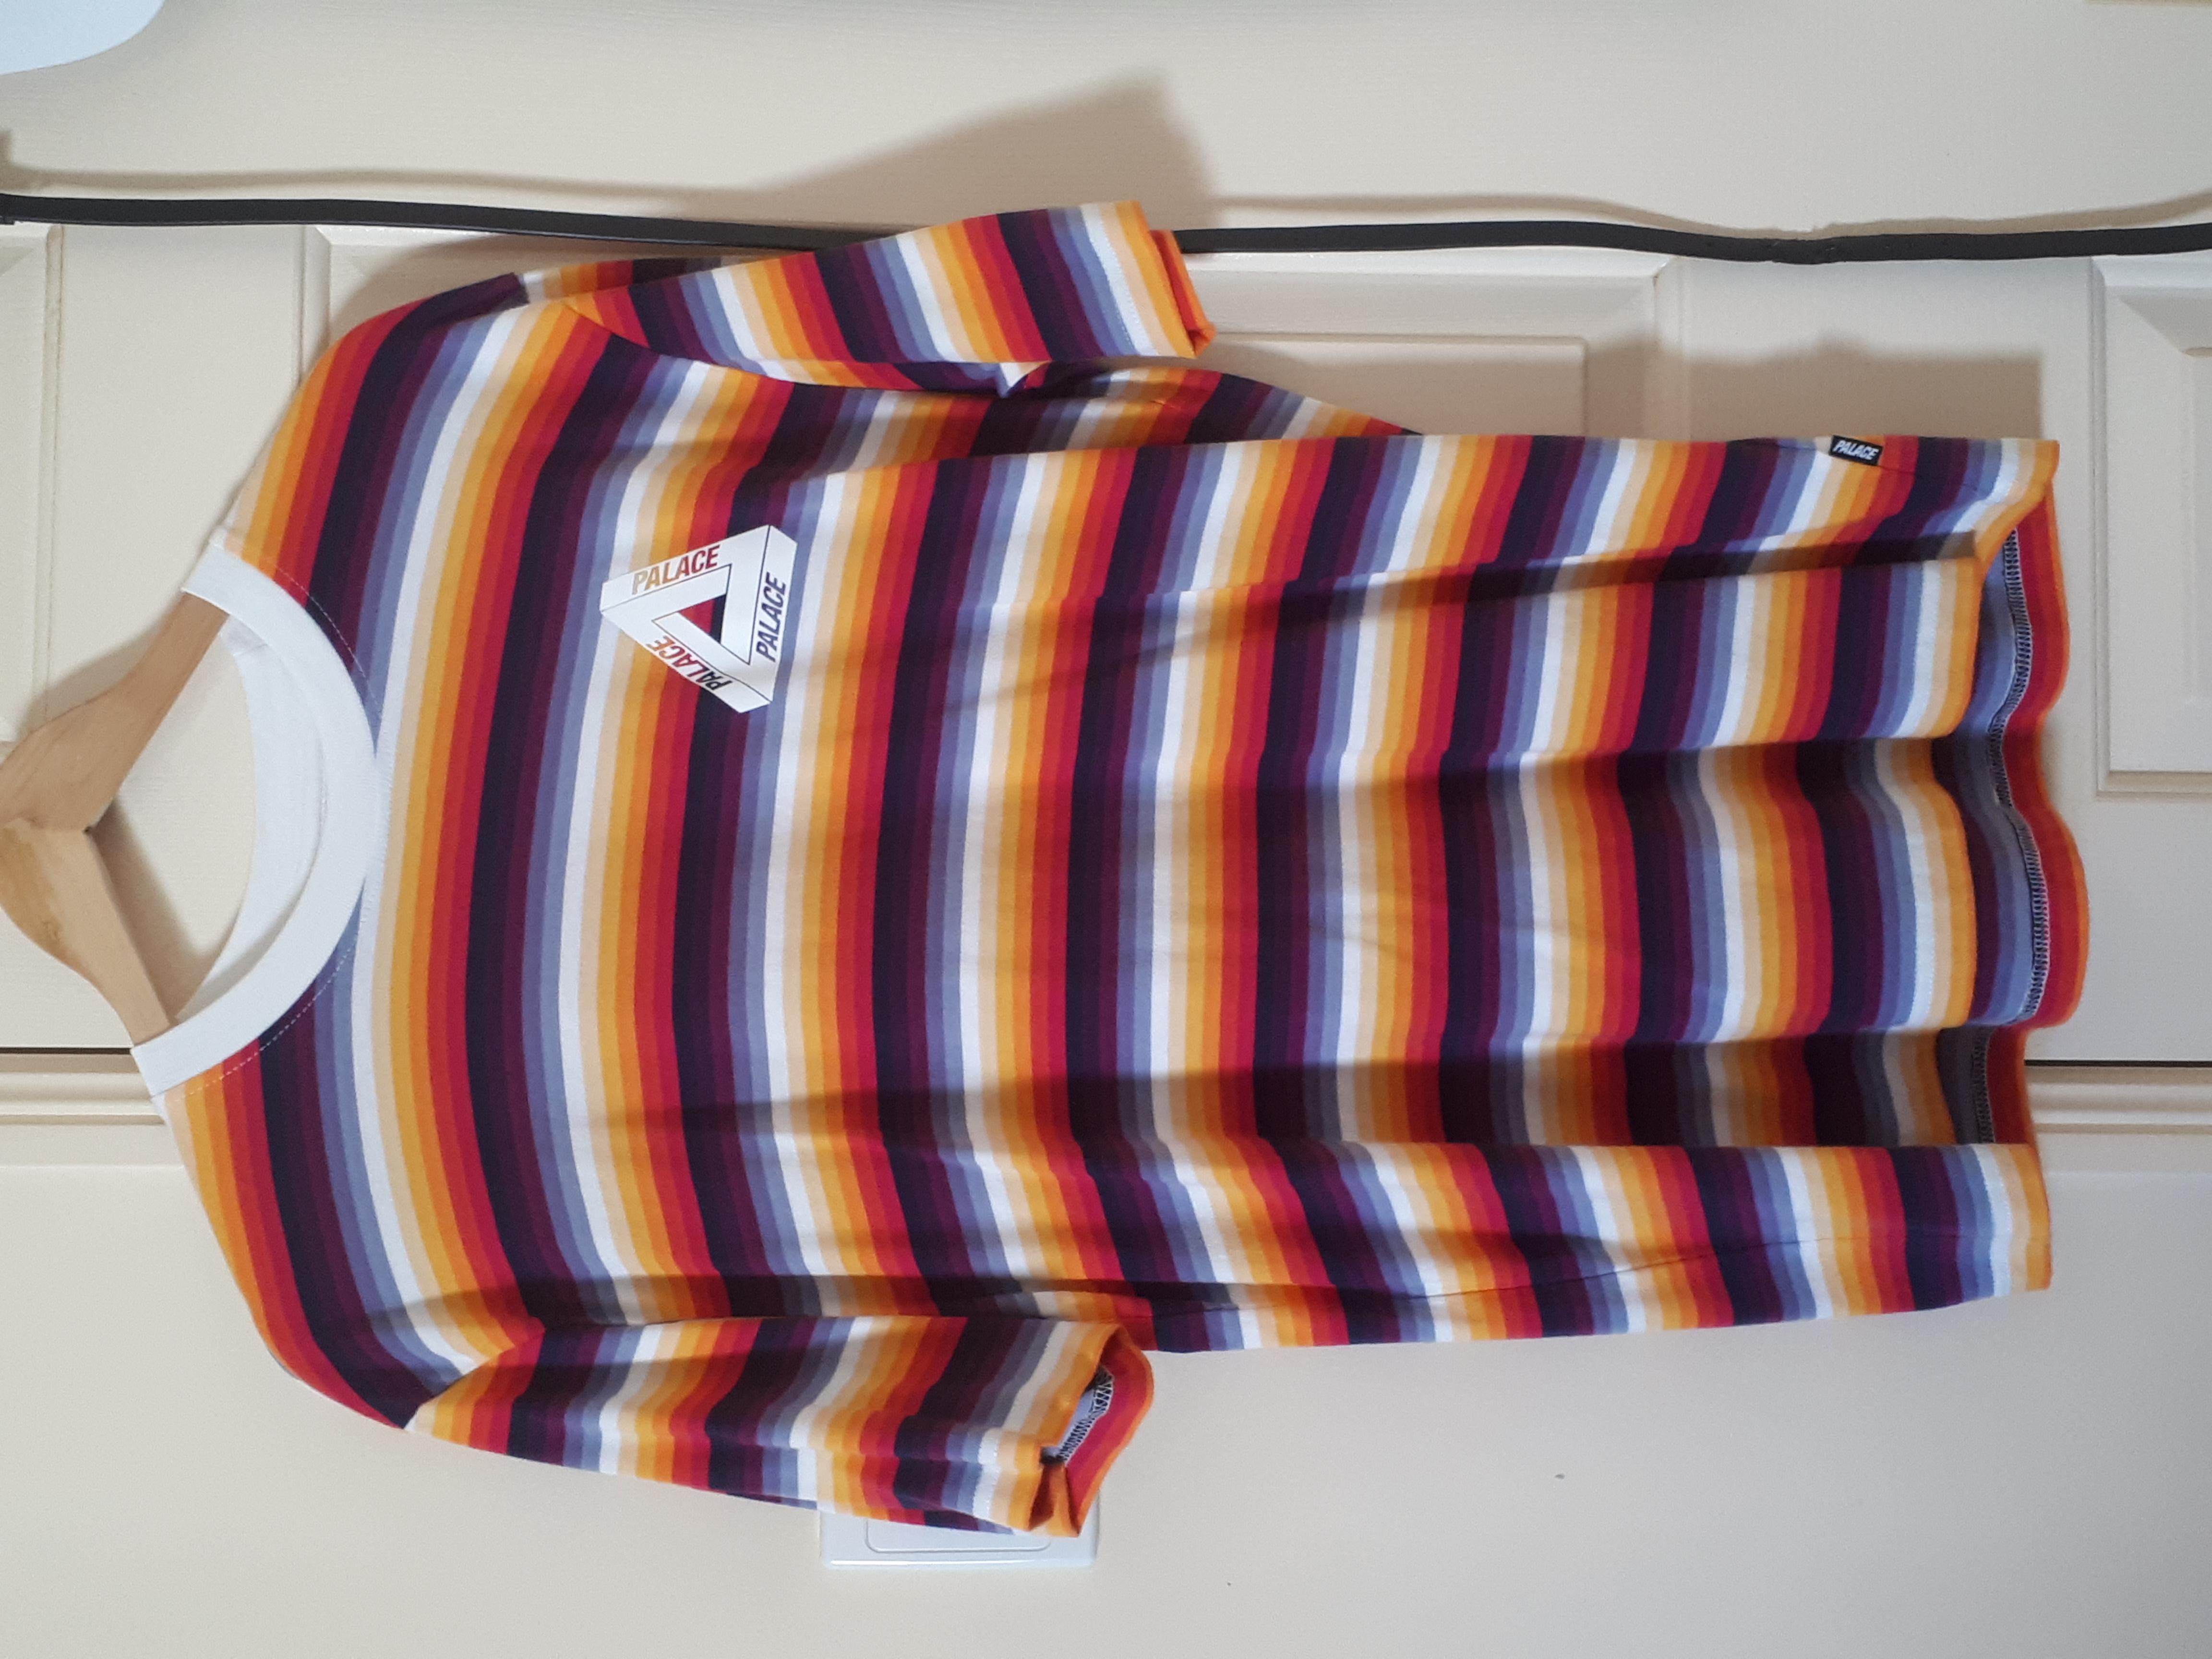 f753b7ddd560 Palace Palace Tri Ferg Thin Stripe tee Size m - Short Sleeve T-Shirts for  Sale - Grailed